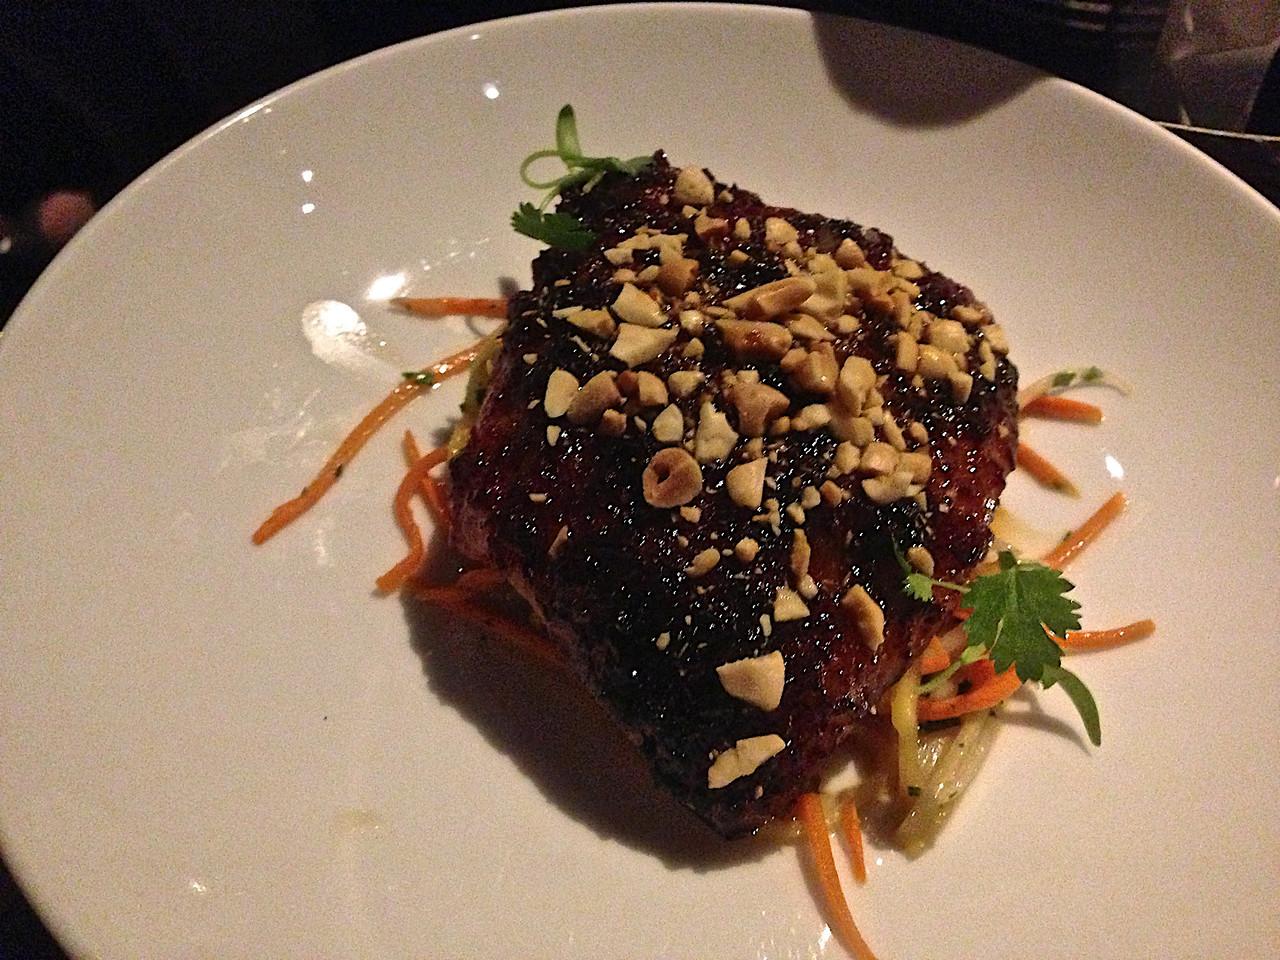 Vietnamese caramel pork jowl